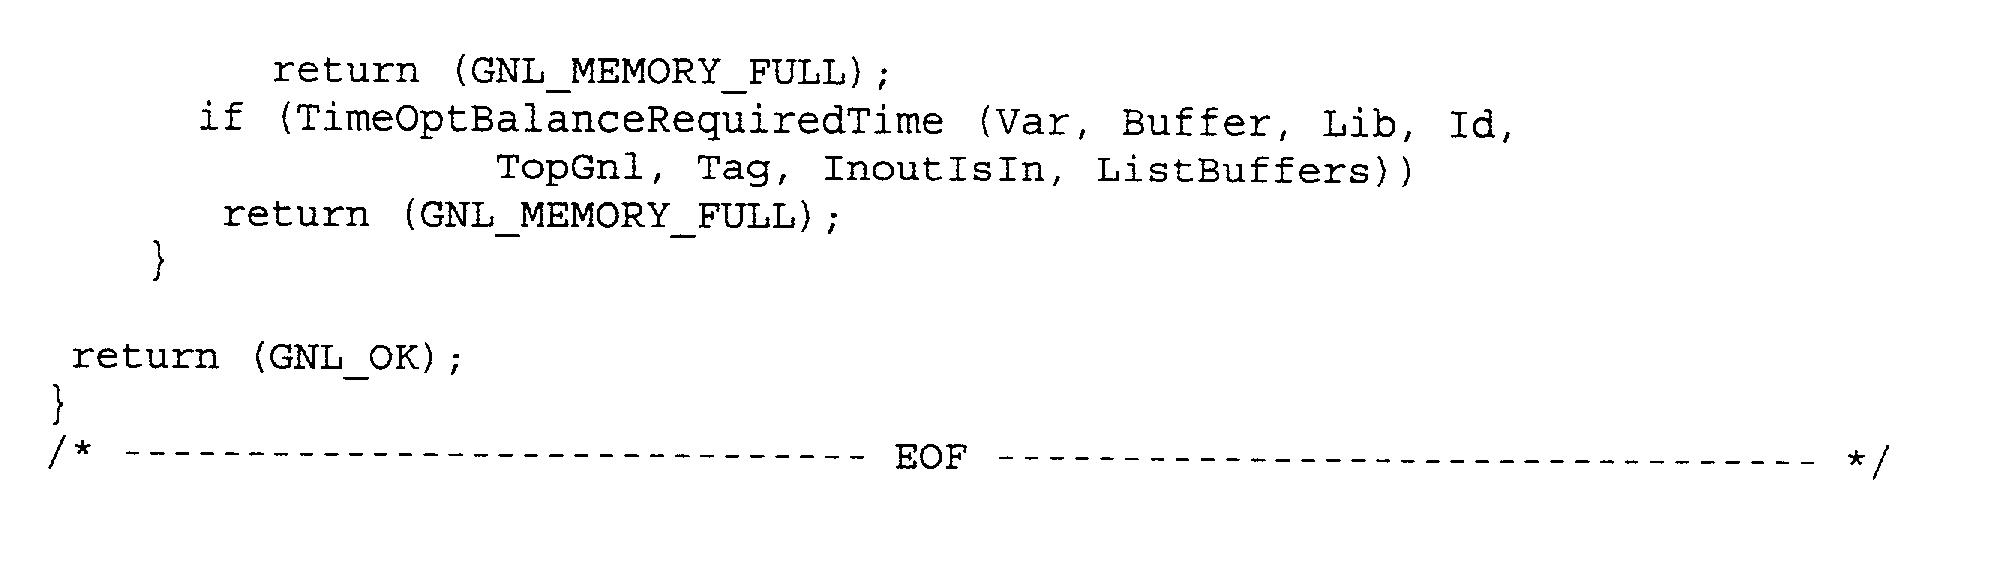 Figure US20020157063A1-20021024-P01755